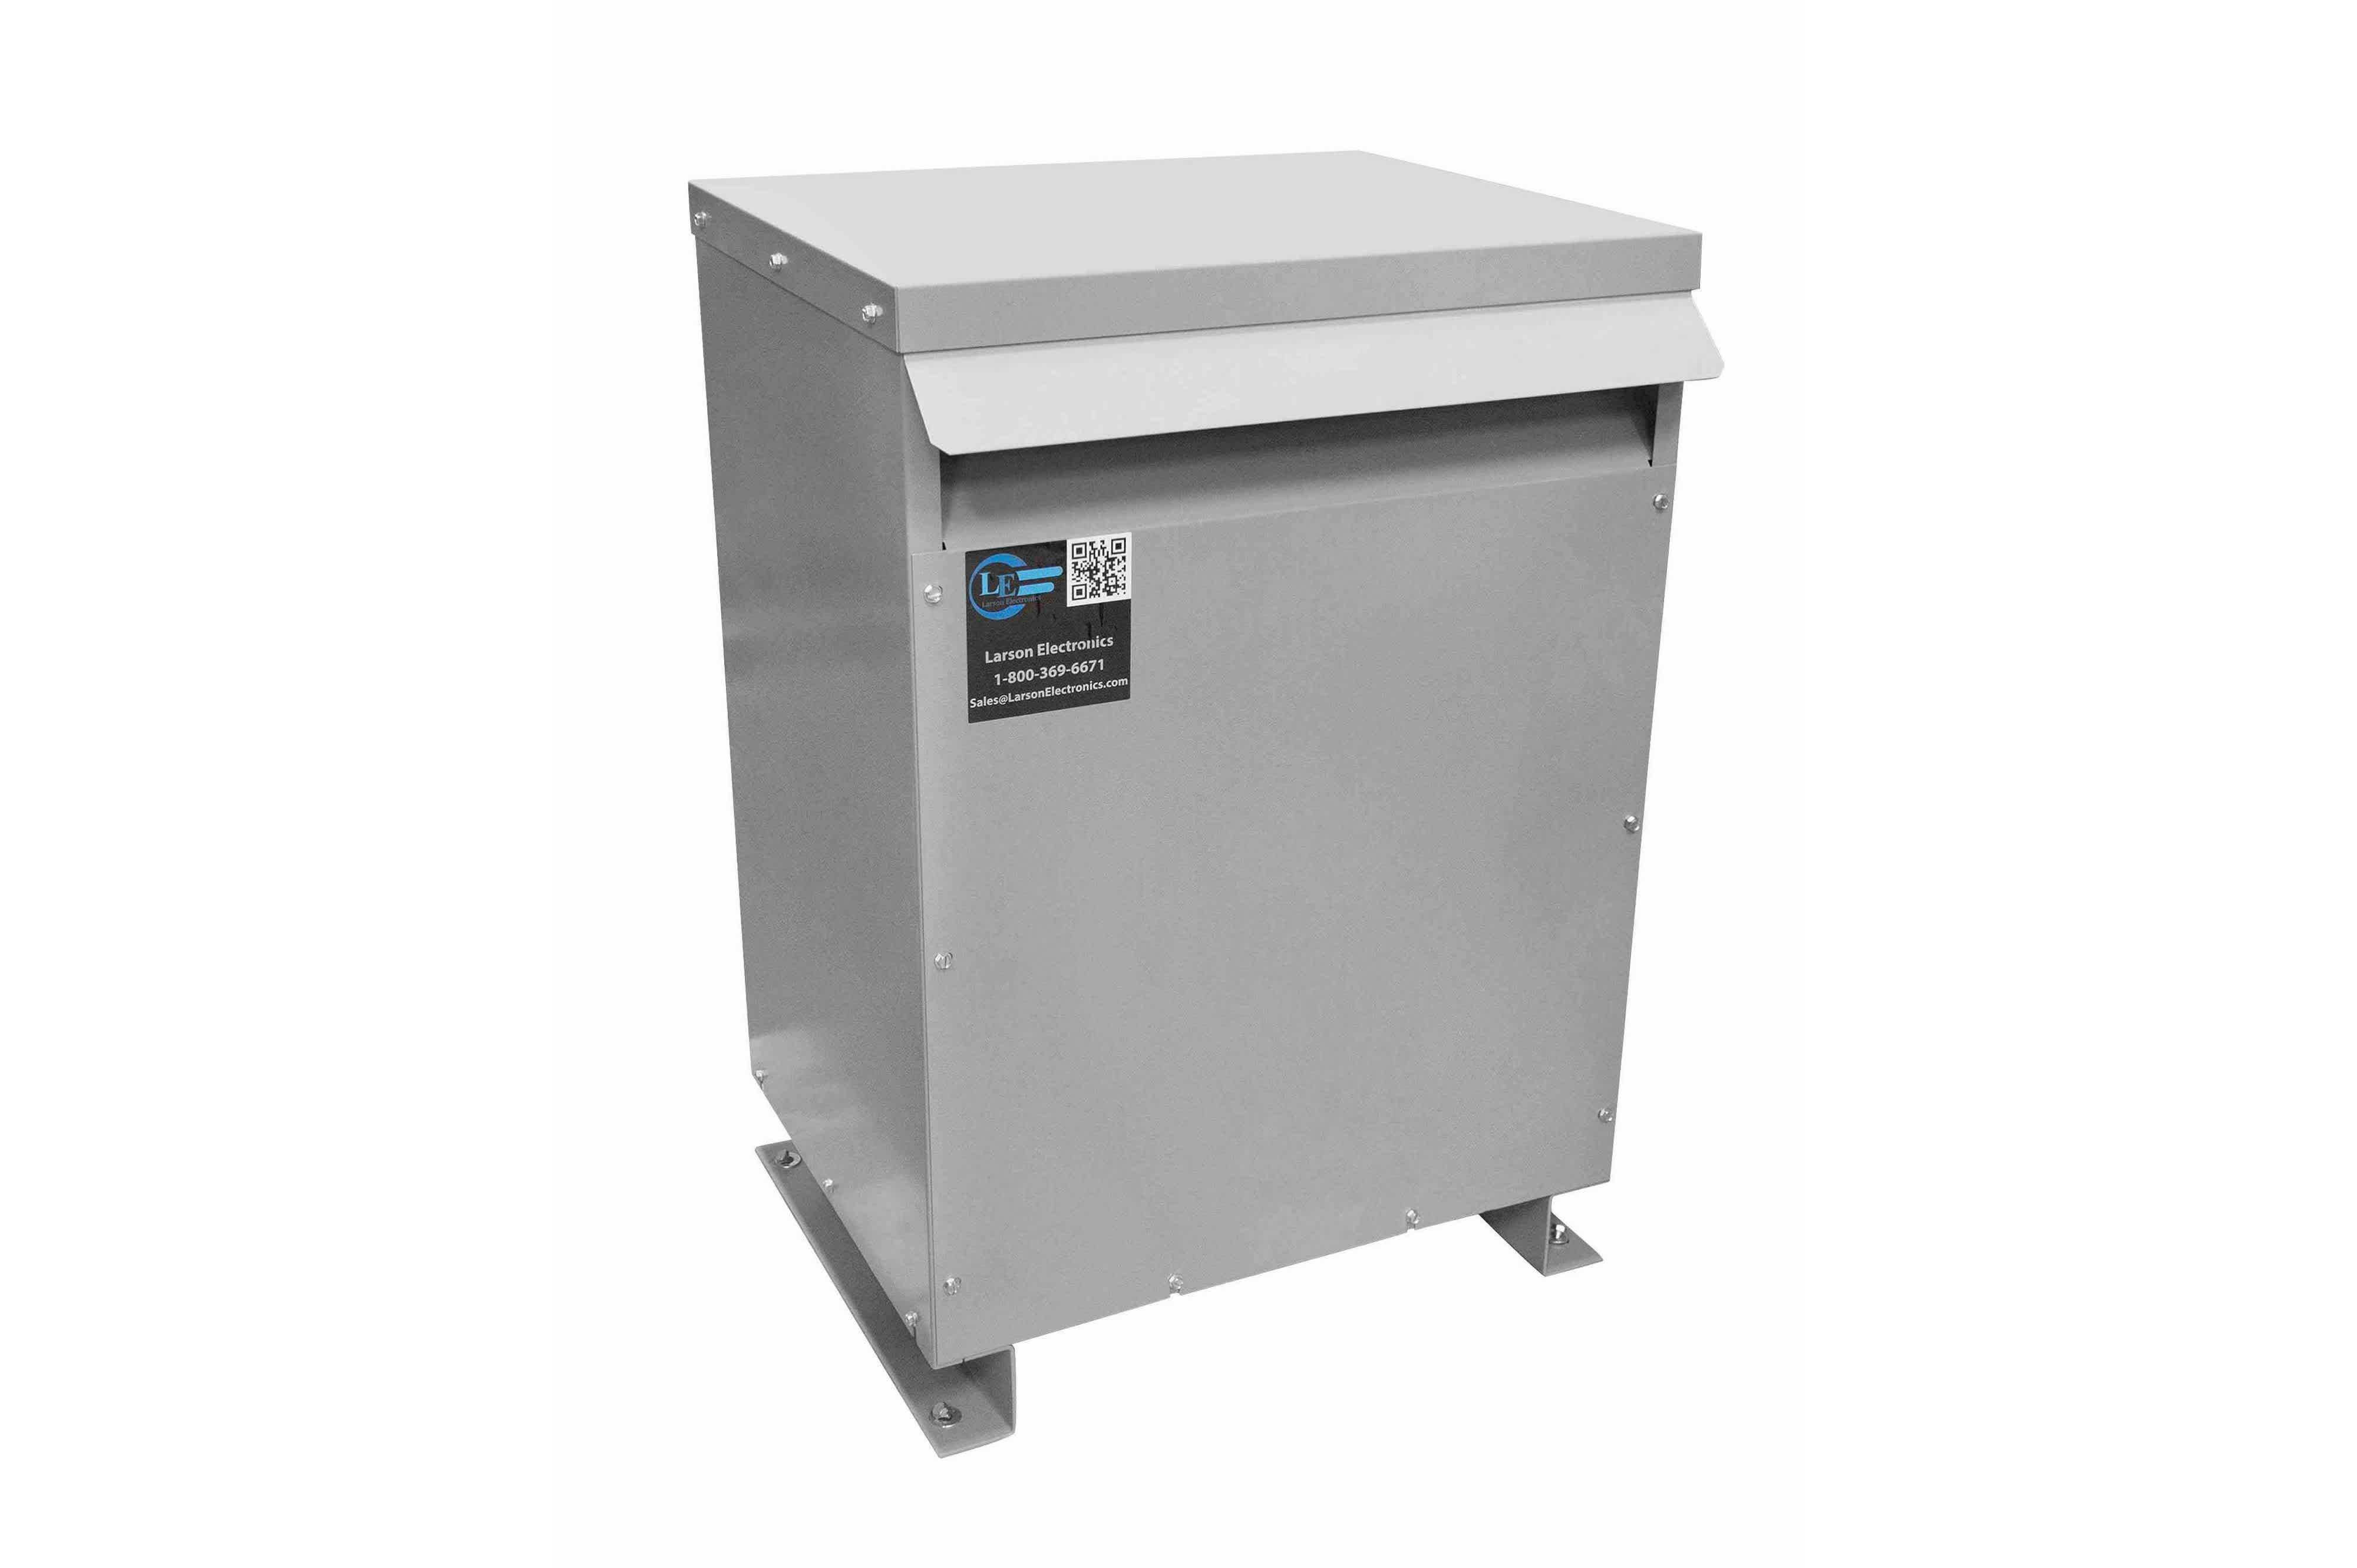 700 kVA 3PH DOE Transformer, 208V Delta Primary, 380Y/220 Wye-N Secondary, N3R, Ventilated, 60 Hz